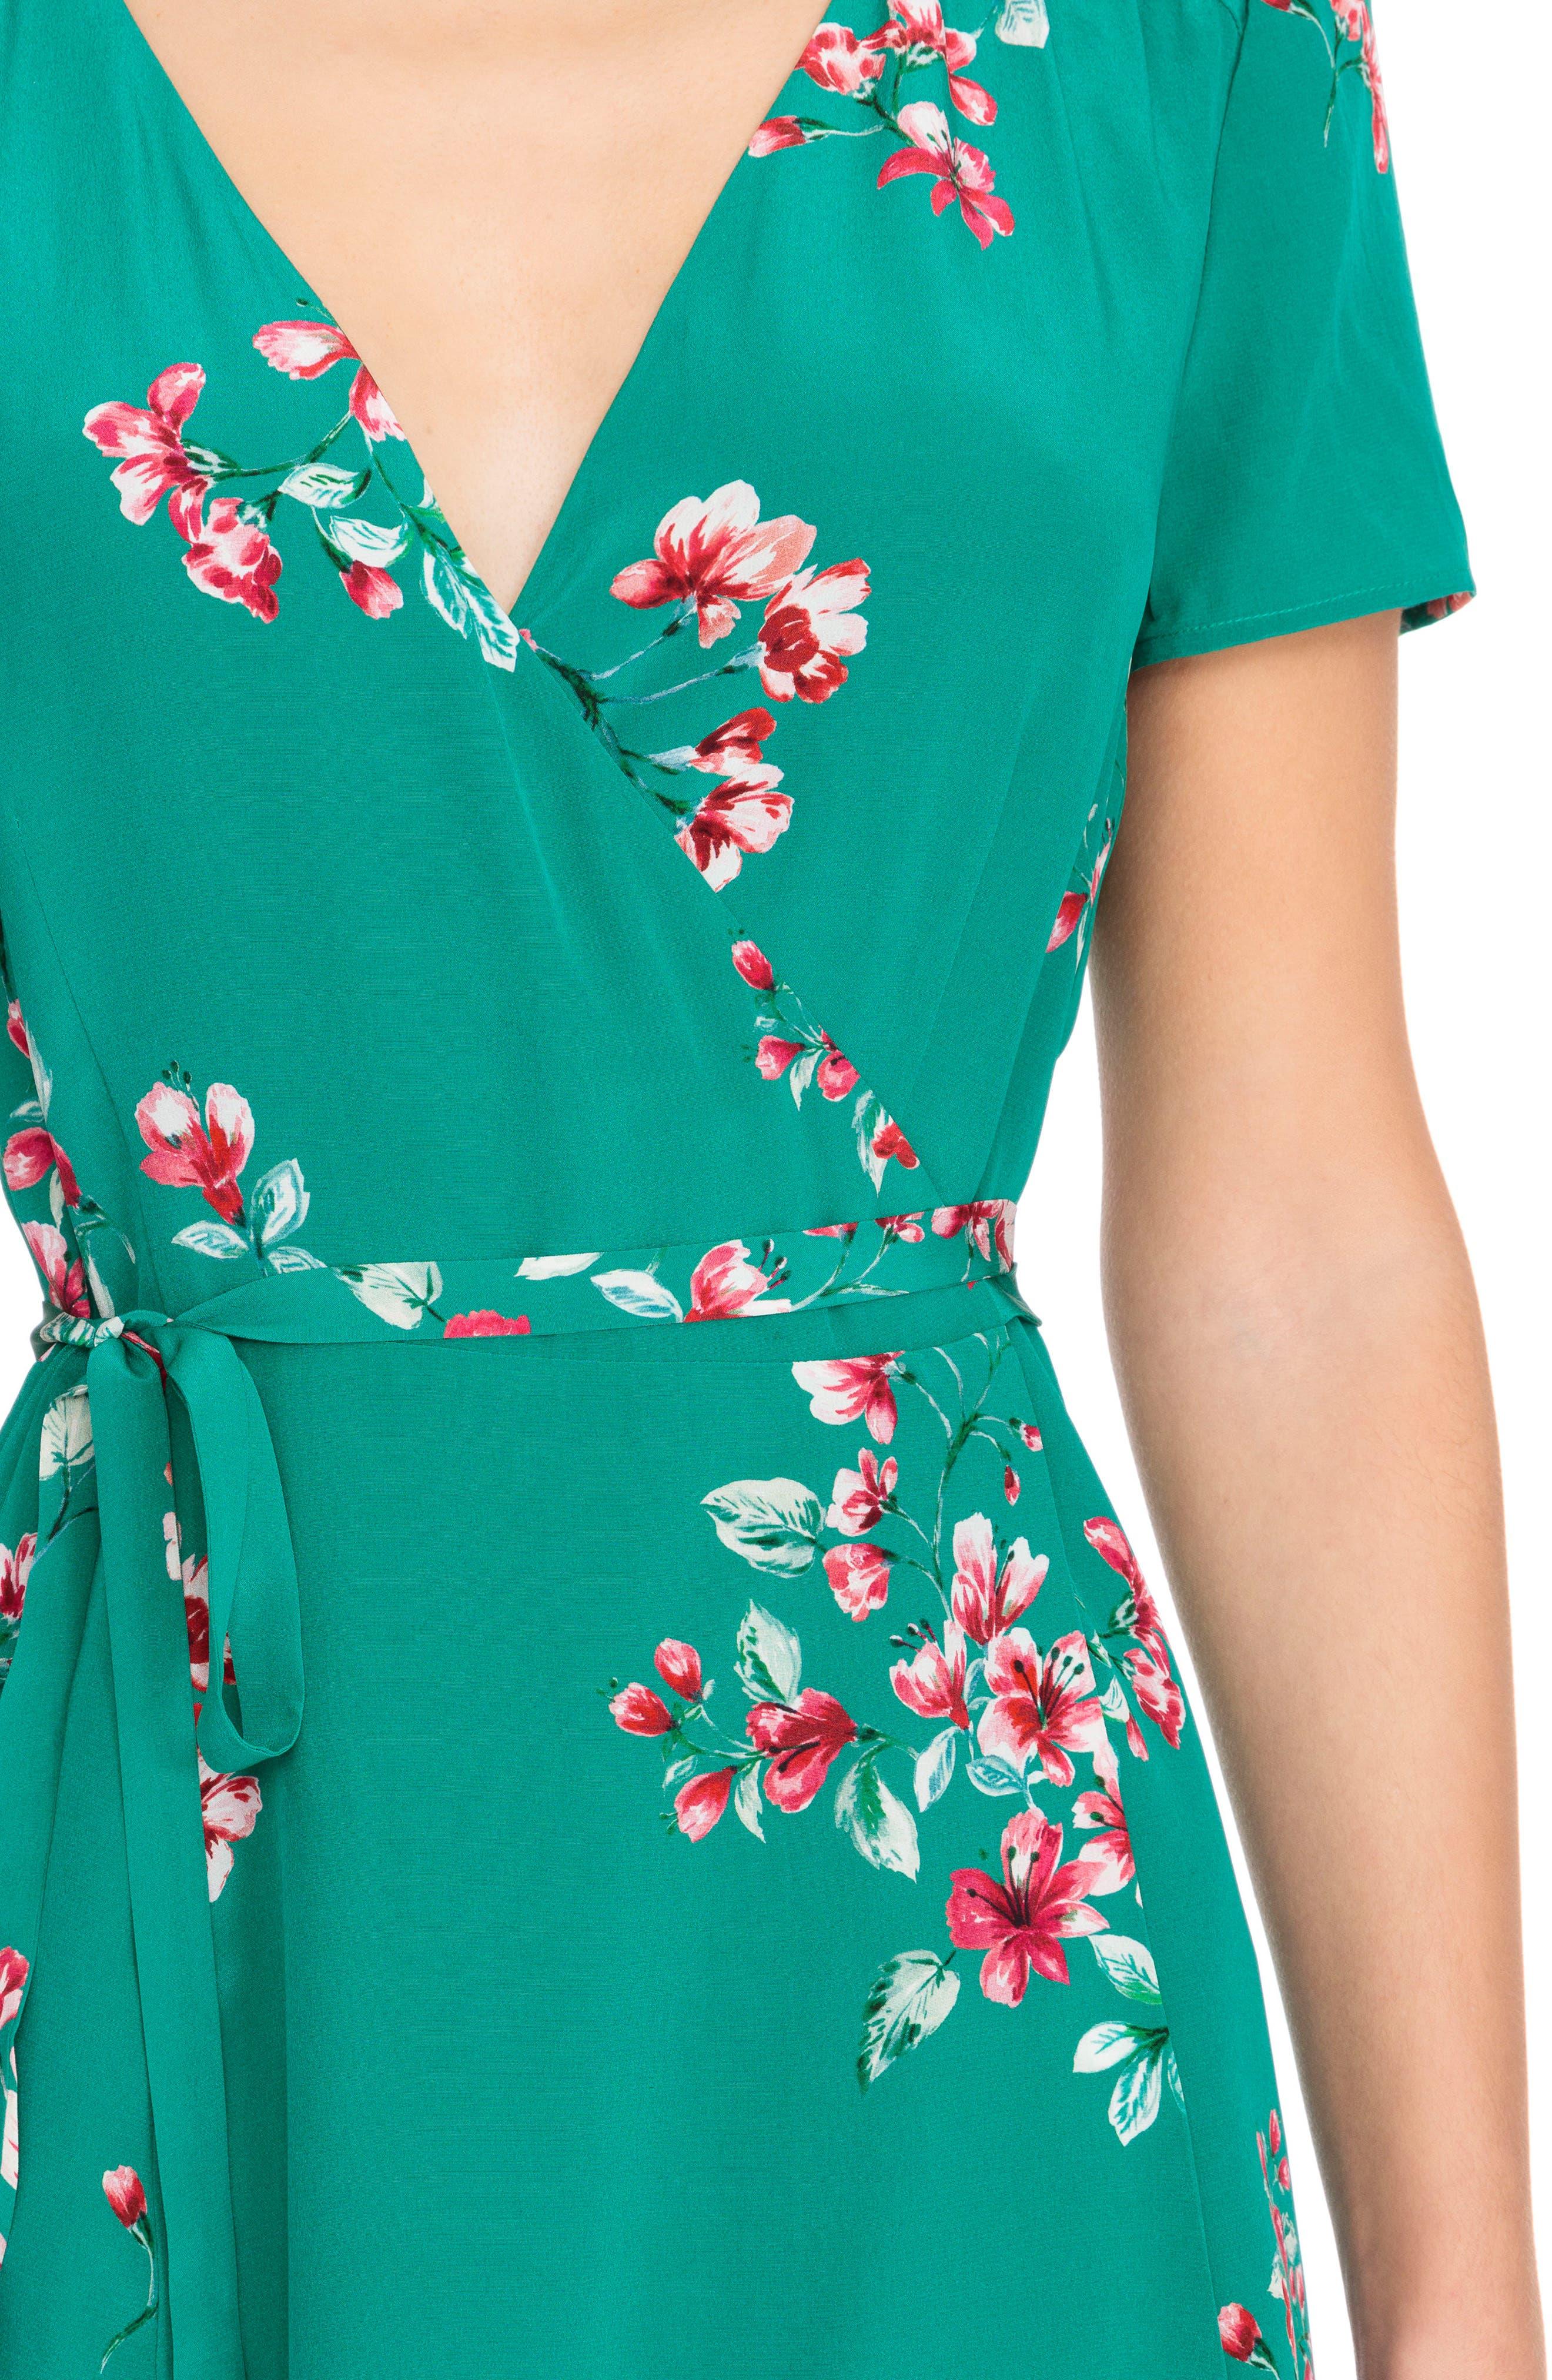 Anastasia Silk Wrap Dress,                             Alternate thumbnail 6, color,                             Bouquet Print On Green